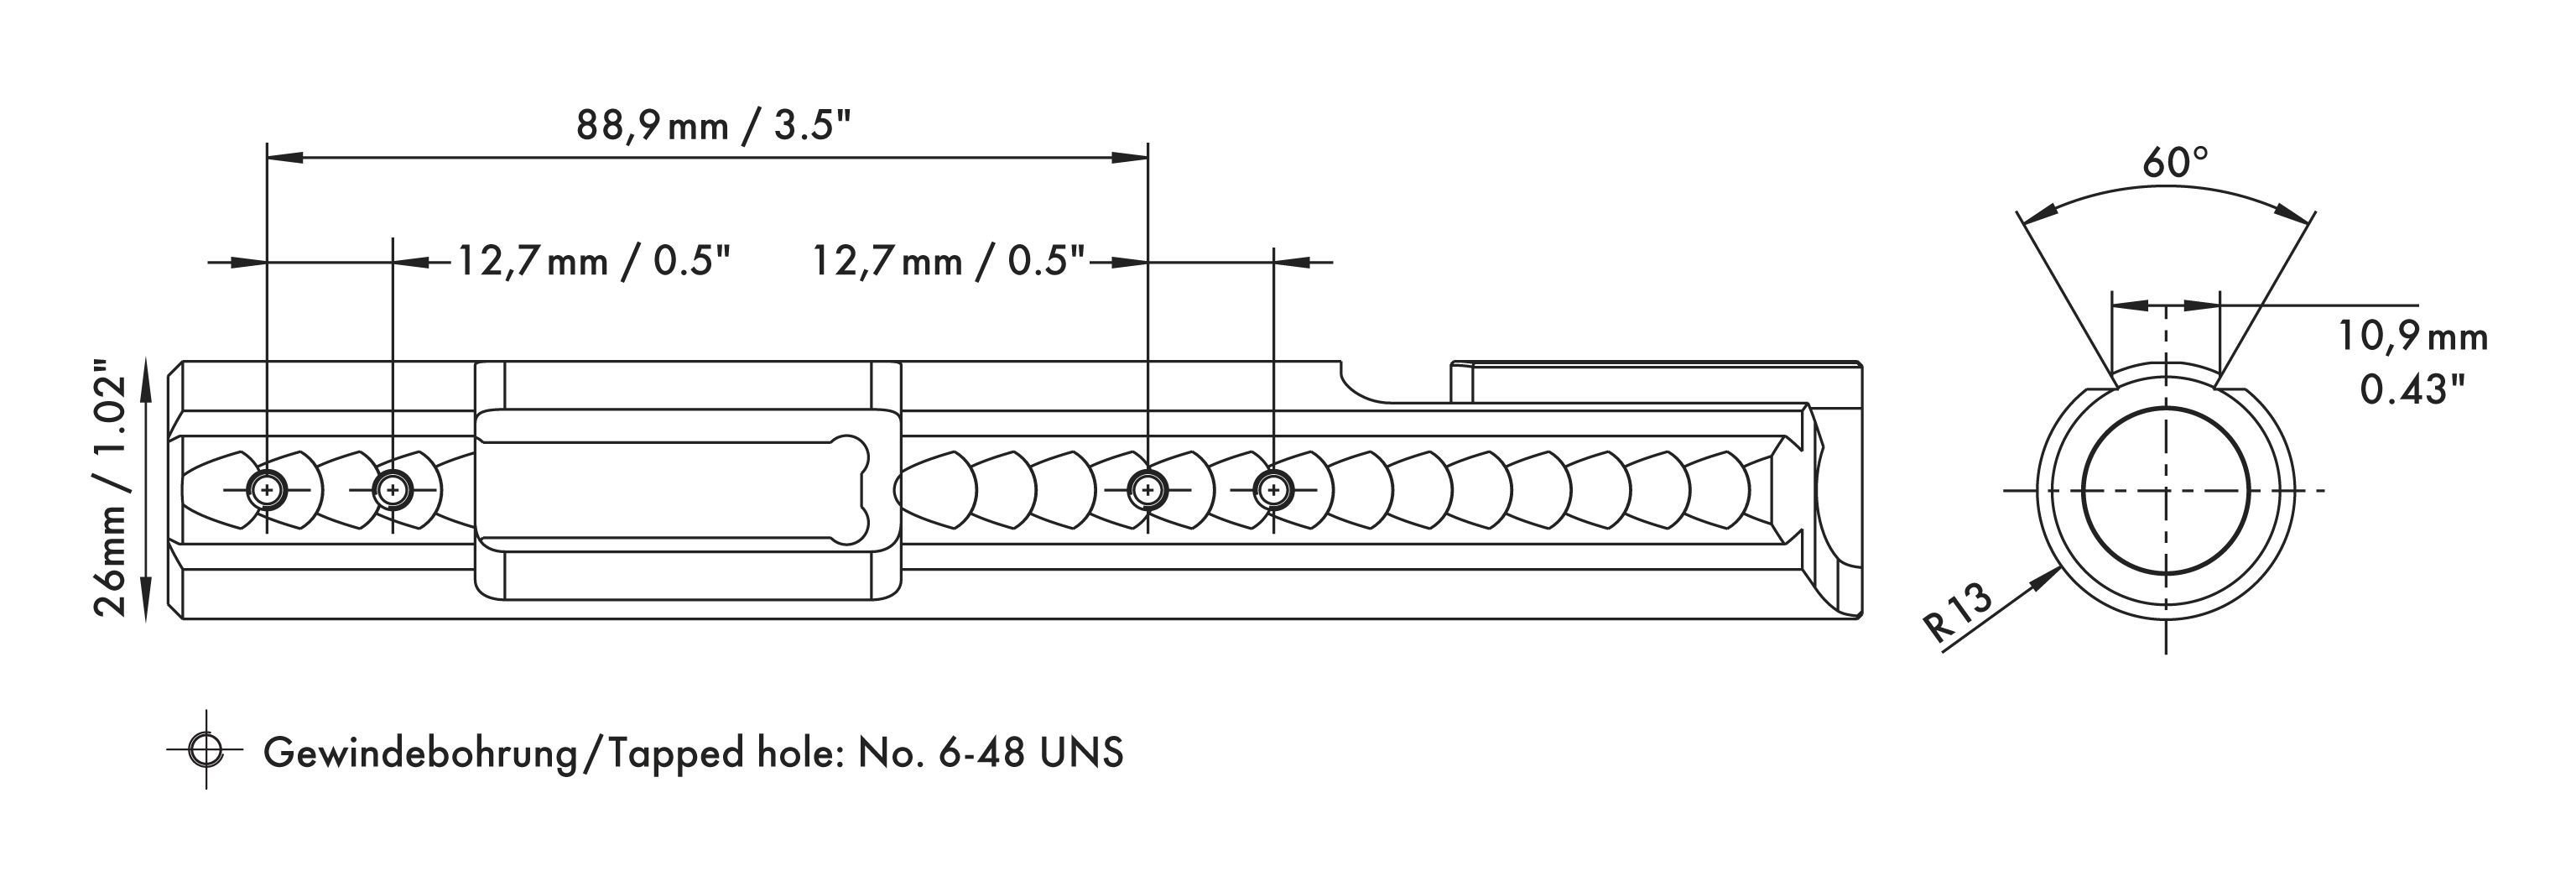 Anschutz 1517 receiver